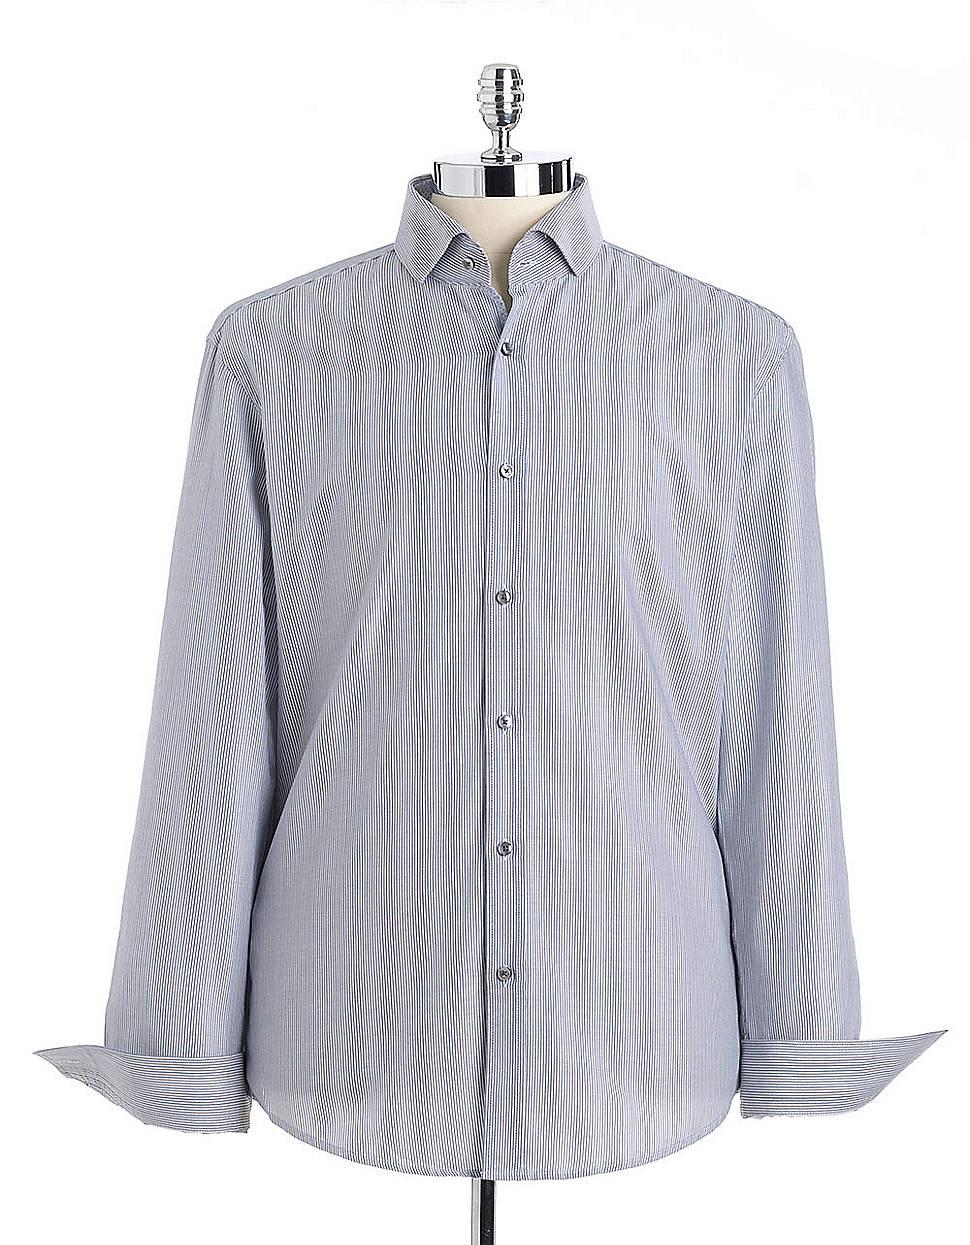 Hugo boss striped cotton button down shirt in blue for men for Hugo boss dress shirt review